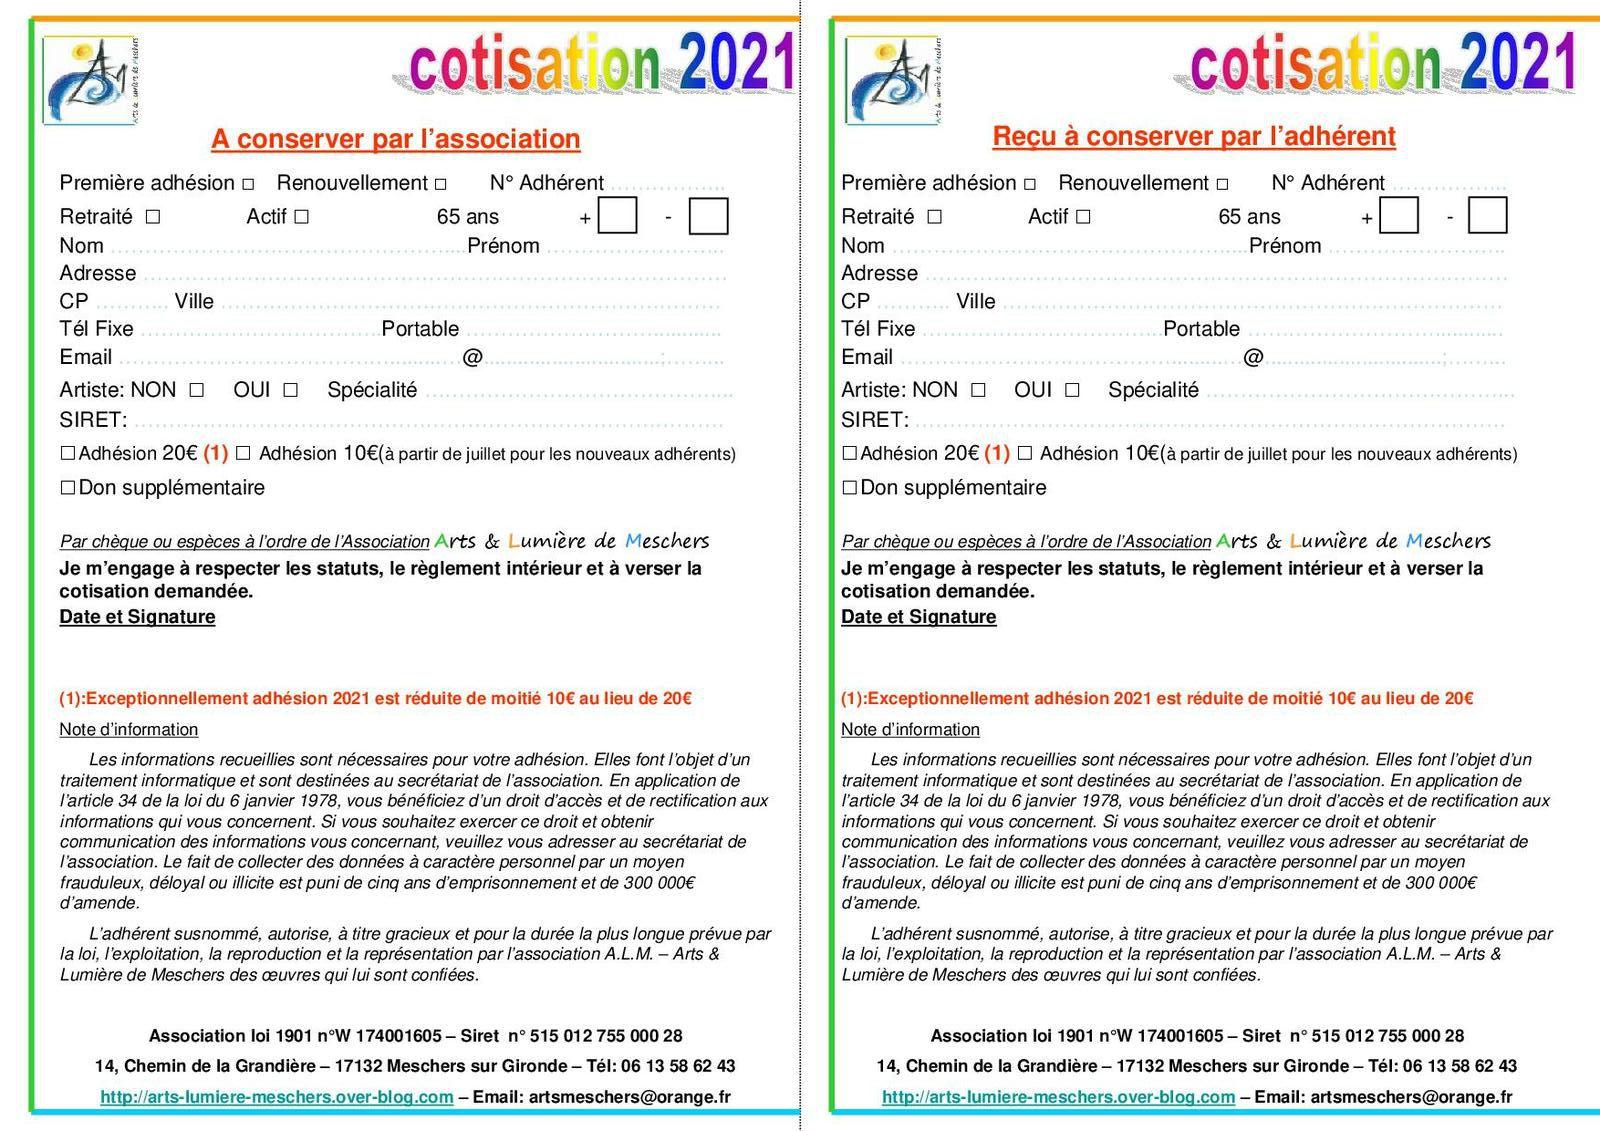 2021 - Bulletin d'adhésion